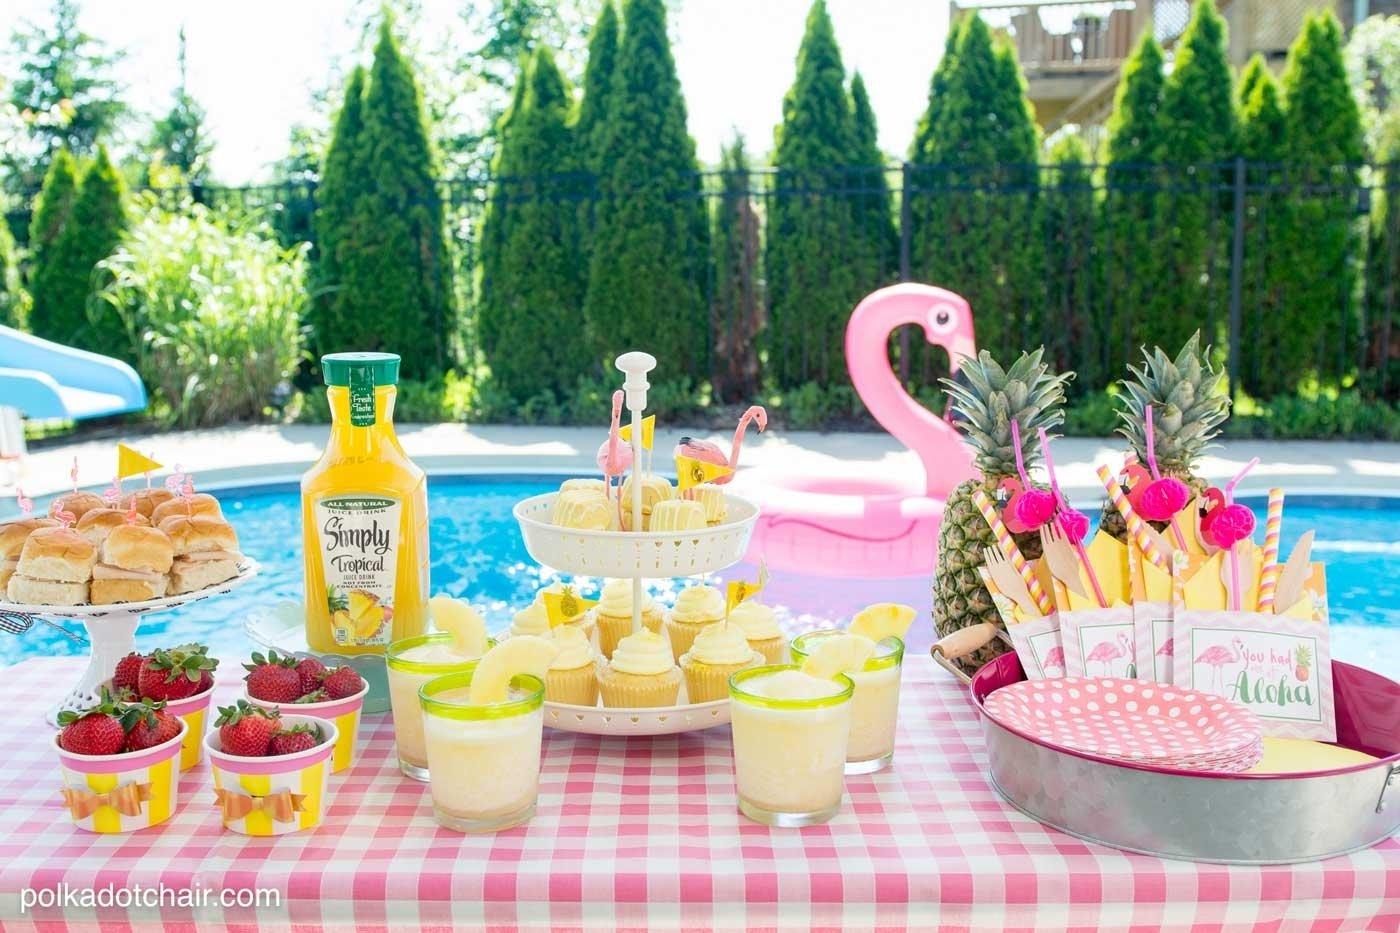 10 Wonderful Sweet 16 Pool Party Ideas summer backyard flamingo pool party ideas the polka dot chair 2 2020